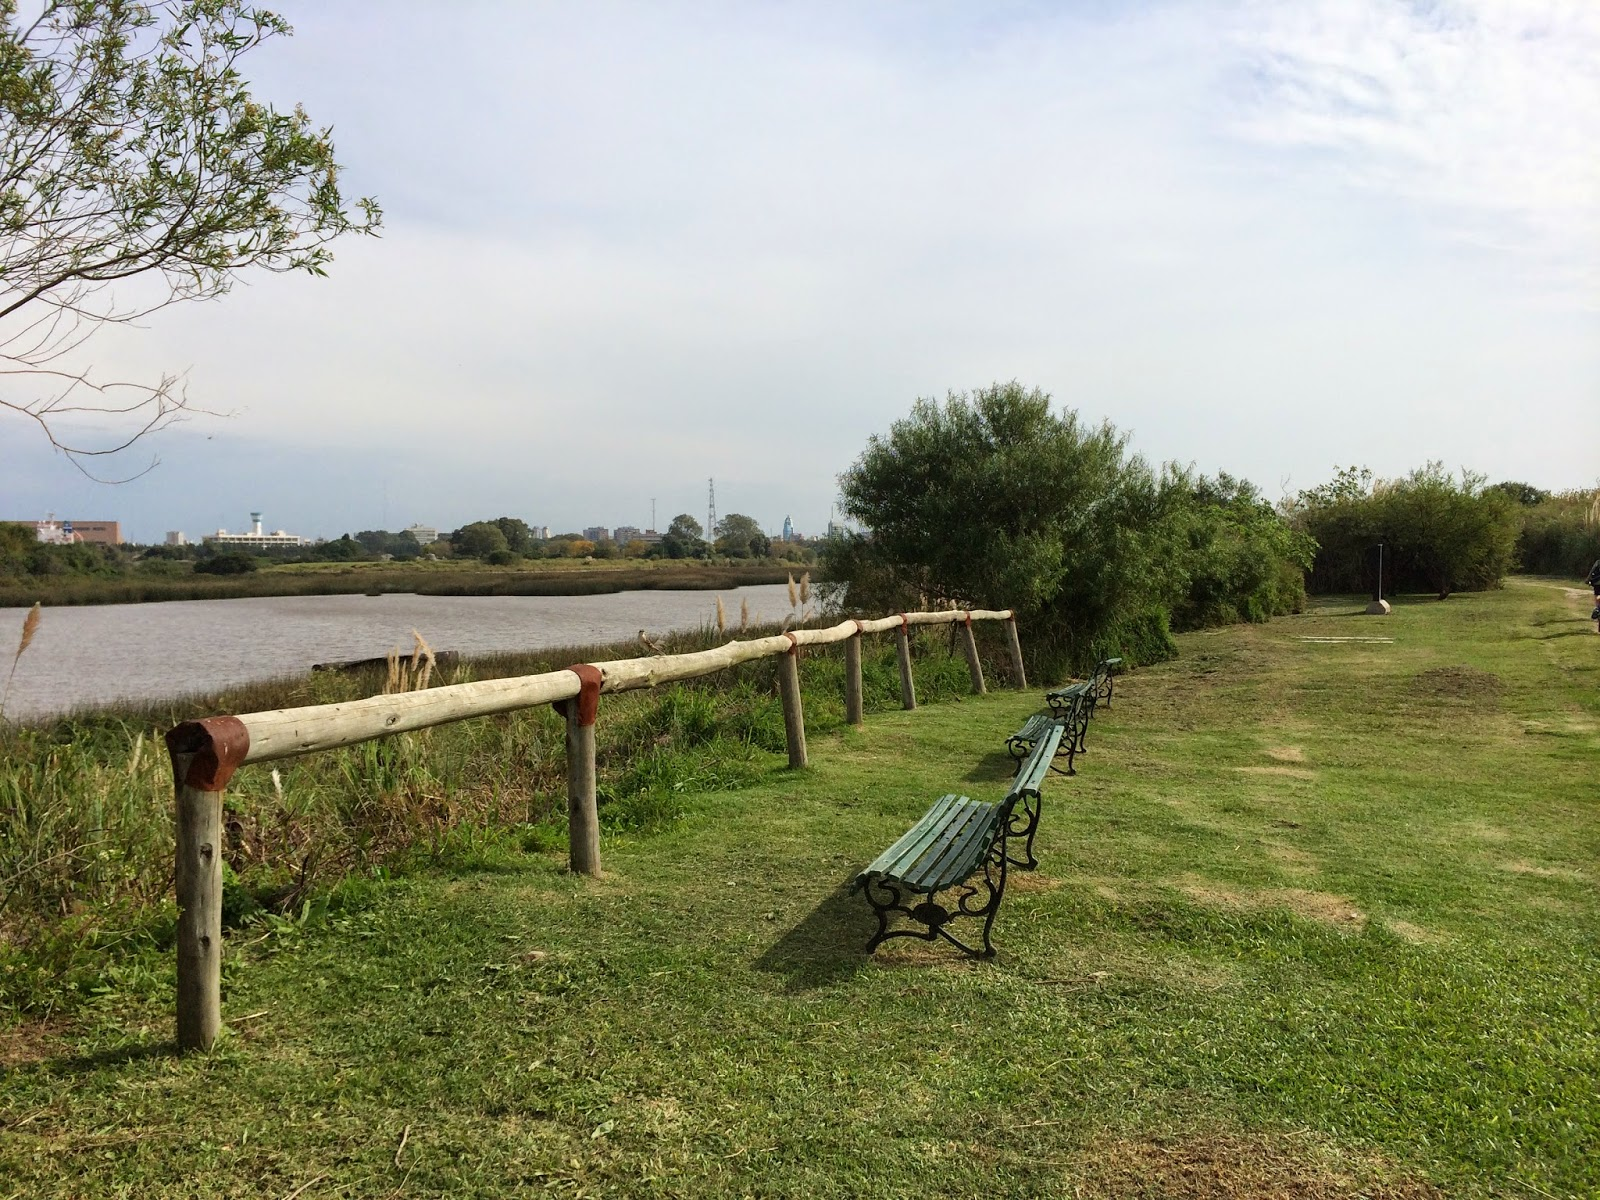 park_reserva_ecologica_argentina_8.jpg